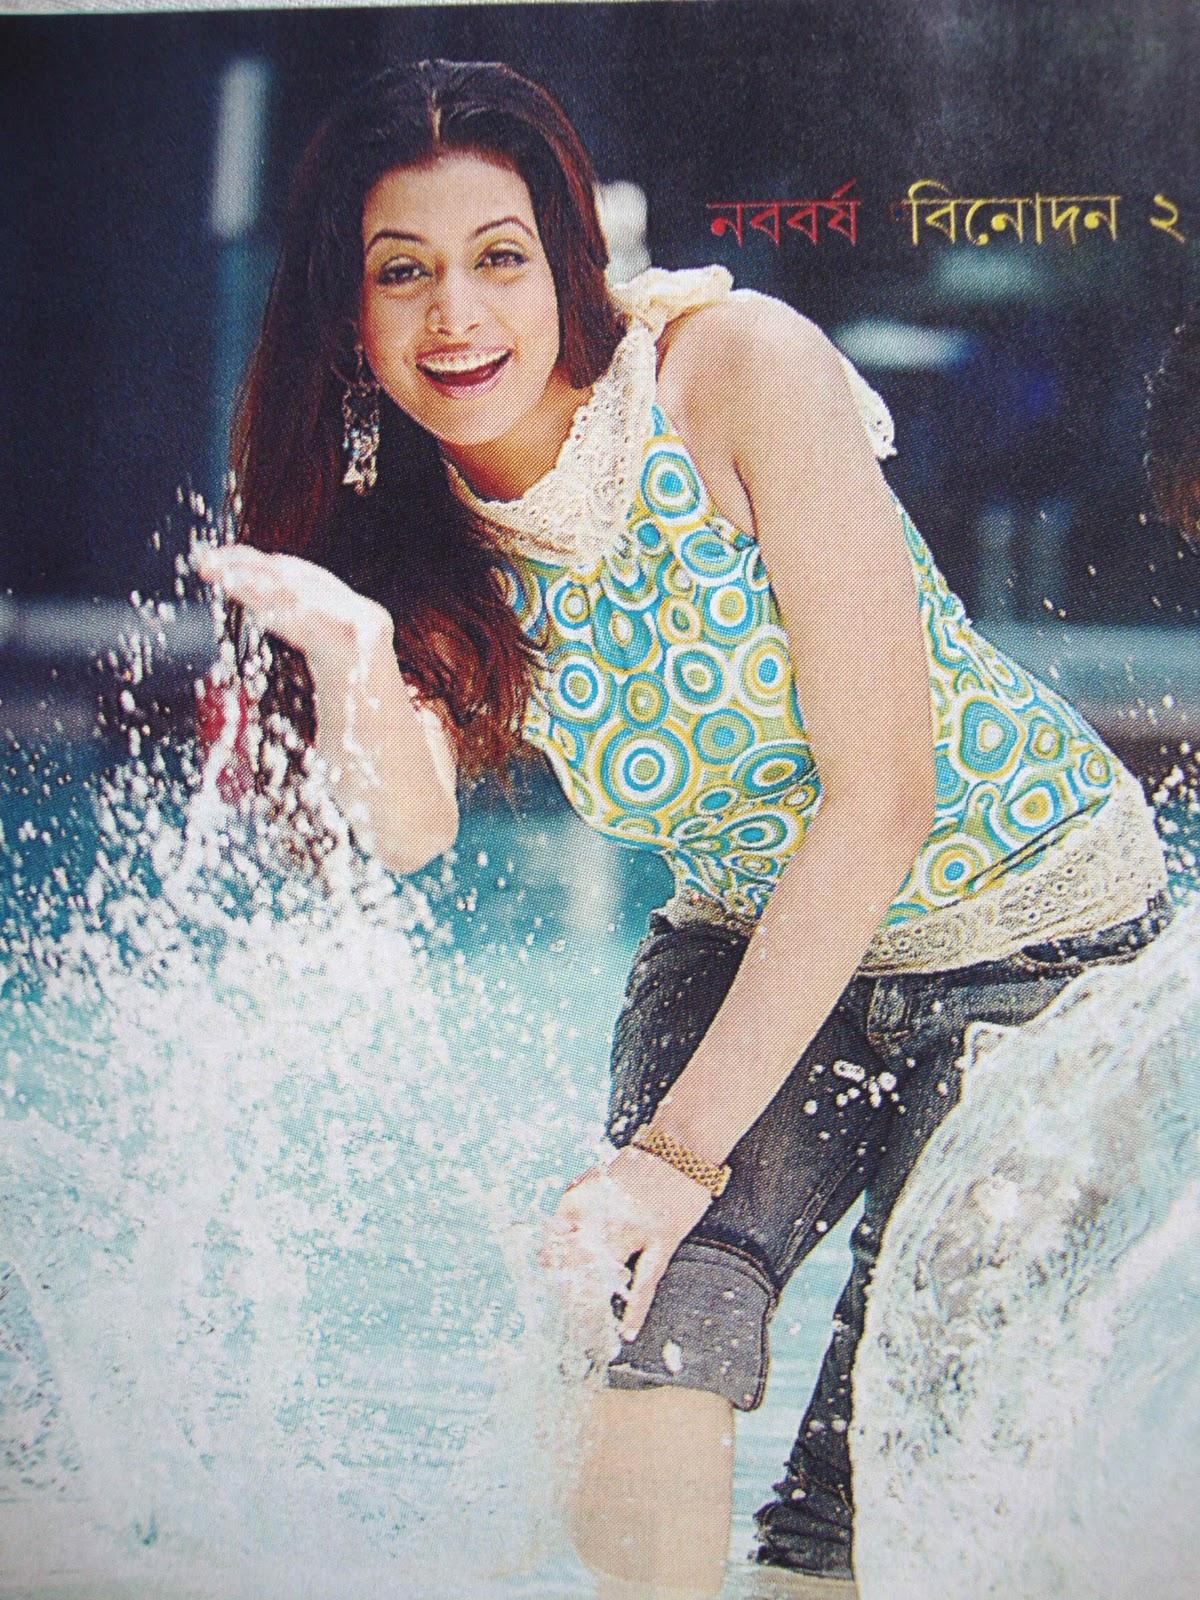 bengali celebrity ,hot models and seductive girl